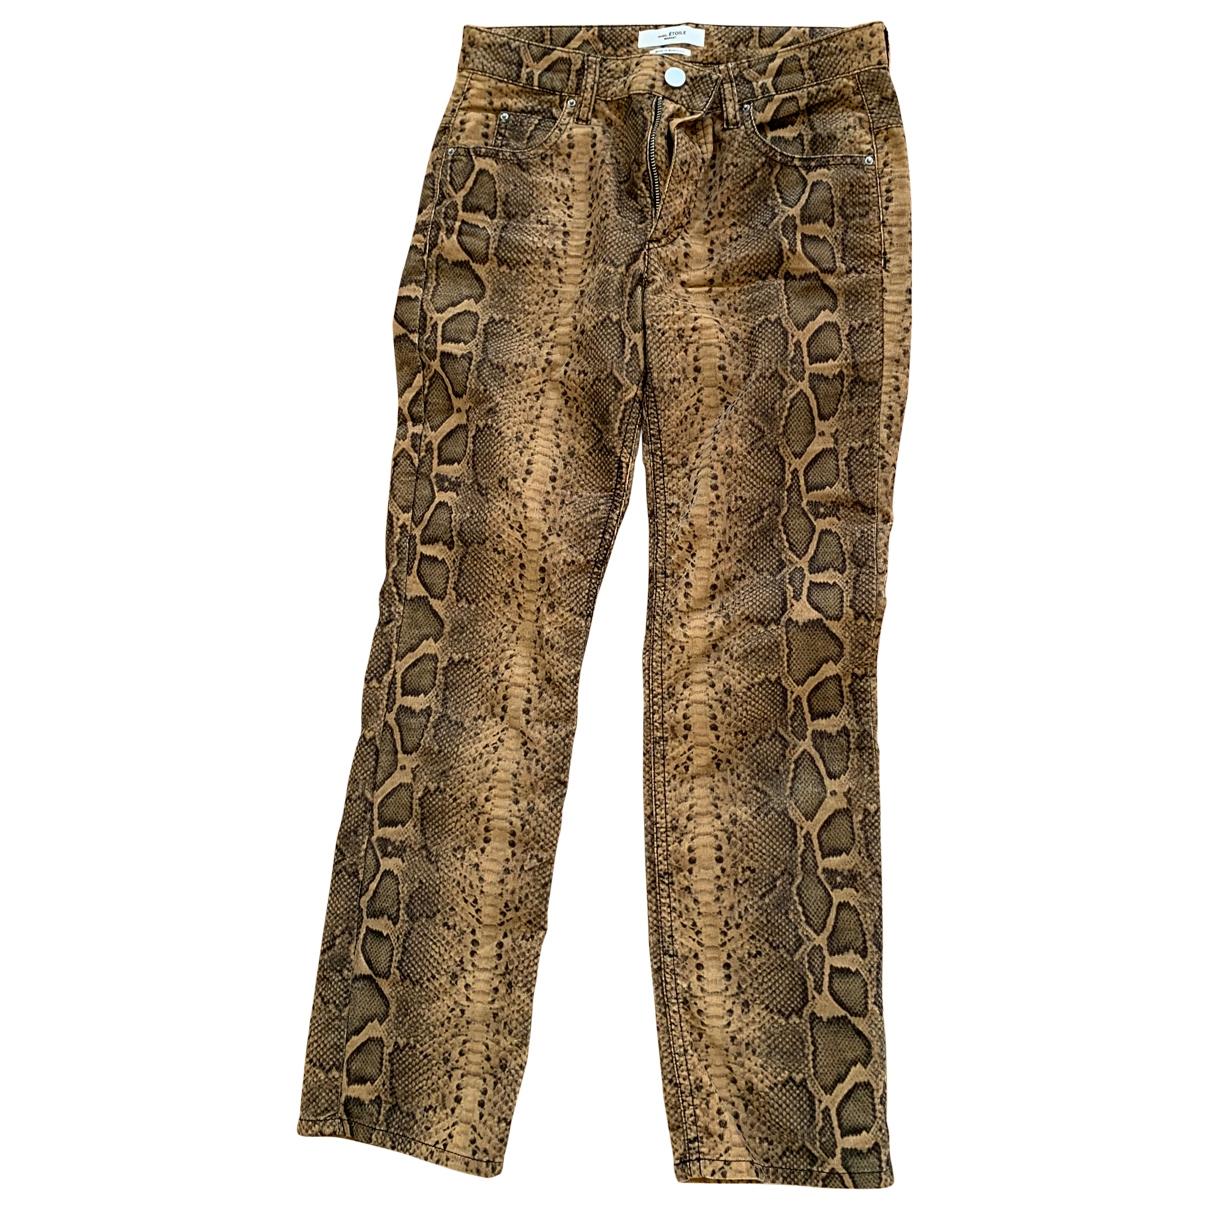 Isabel Marant Etoile \N Beige Cotton Trousers for Women 34 FR